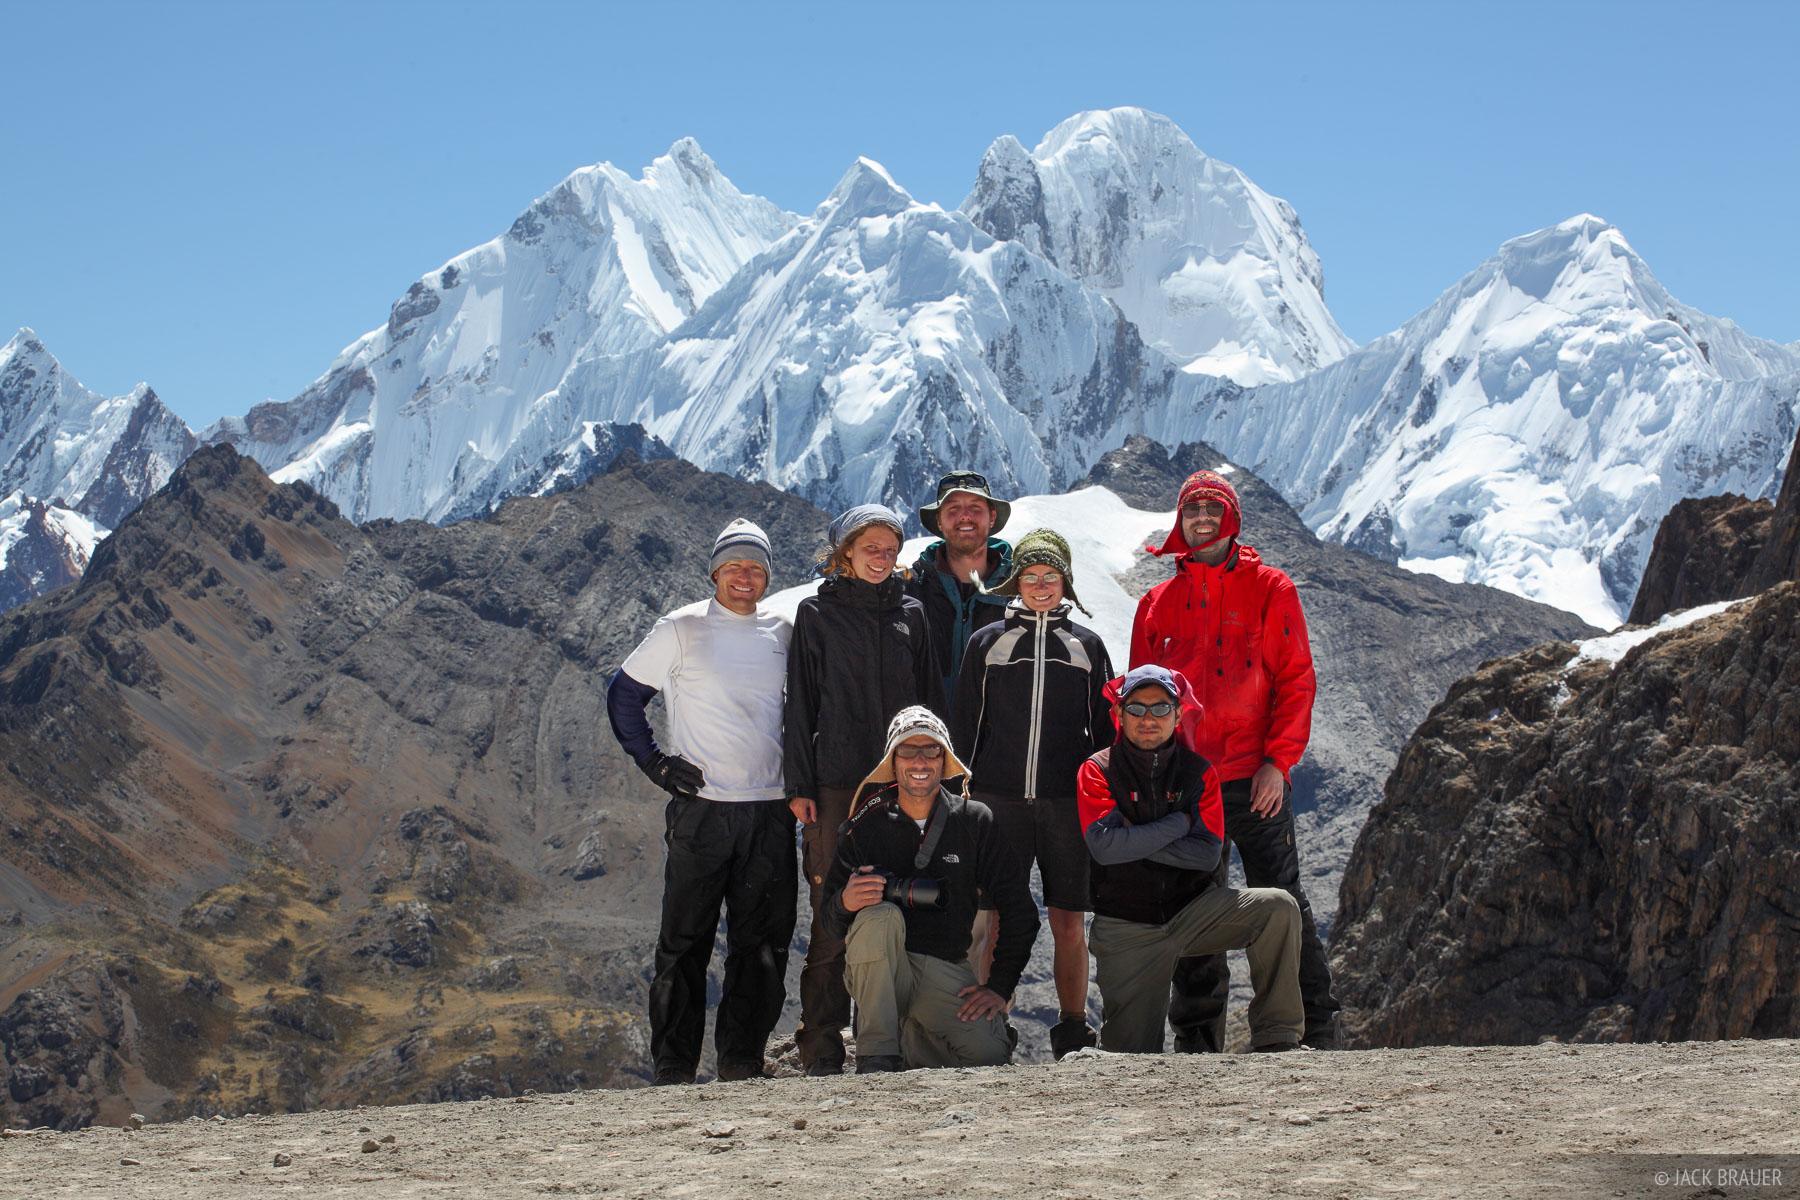 Cordillera Huayhuash, Peru, South America, Punta Cuyoc, photo